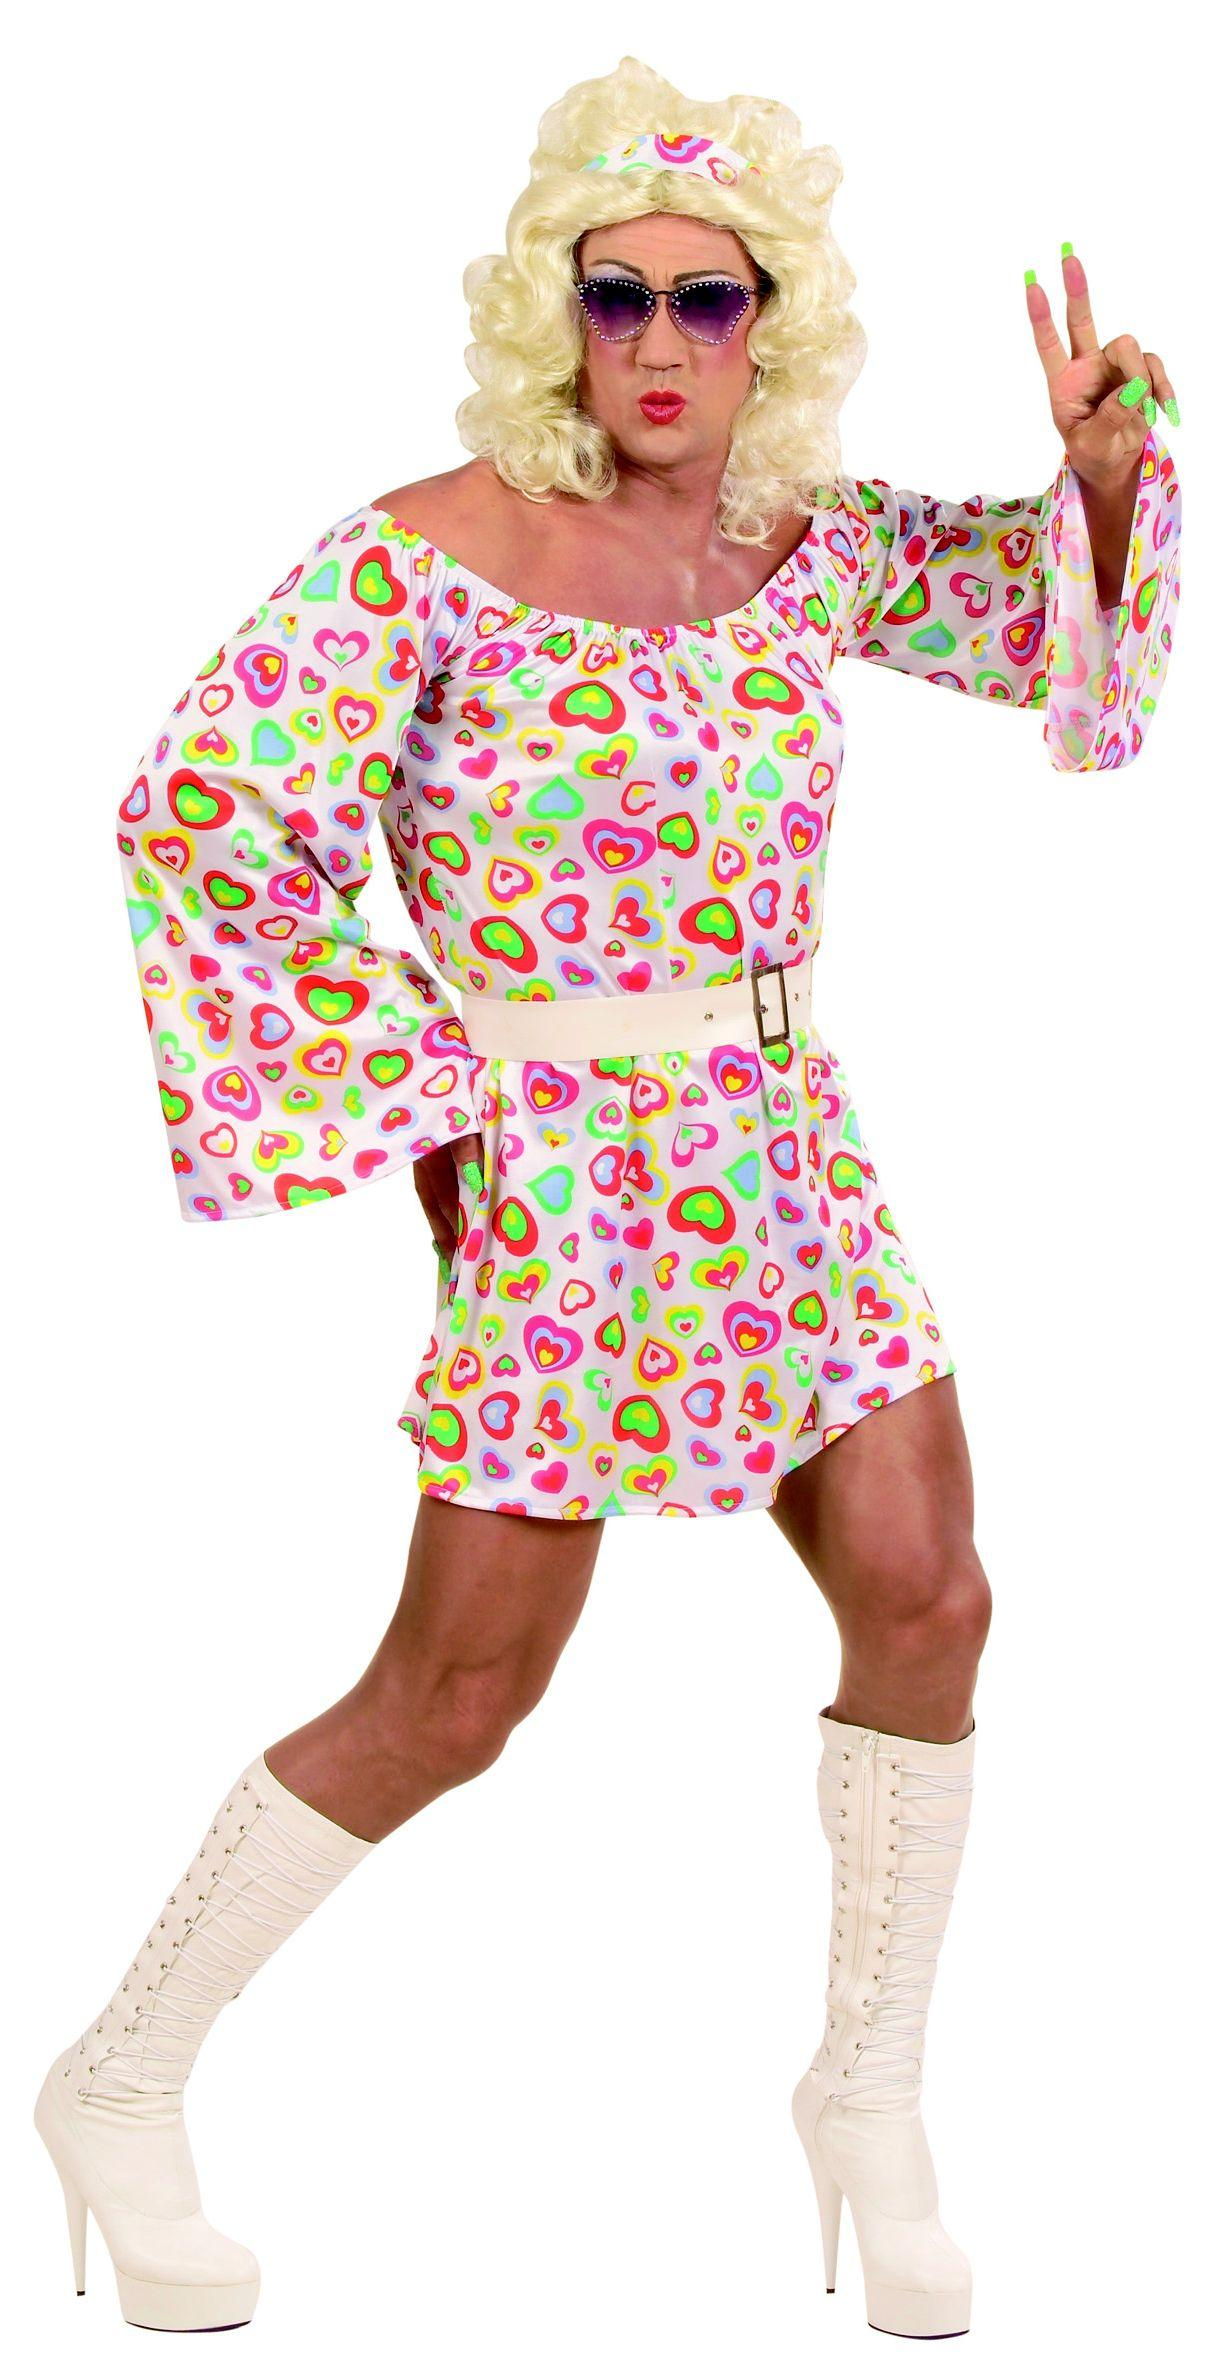 Disfraz de hippie anos 60 para mujer 29 99 gastos de envio for Disfraz de hippie